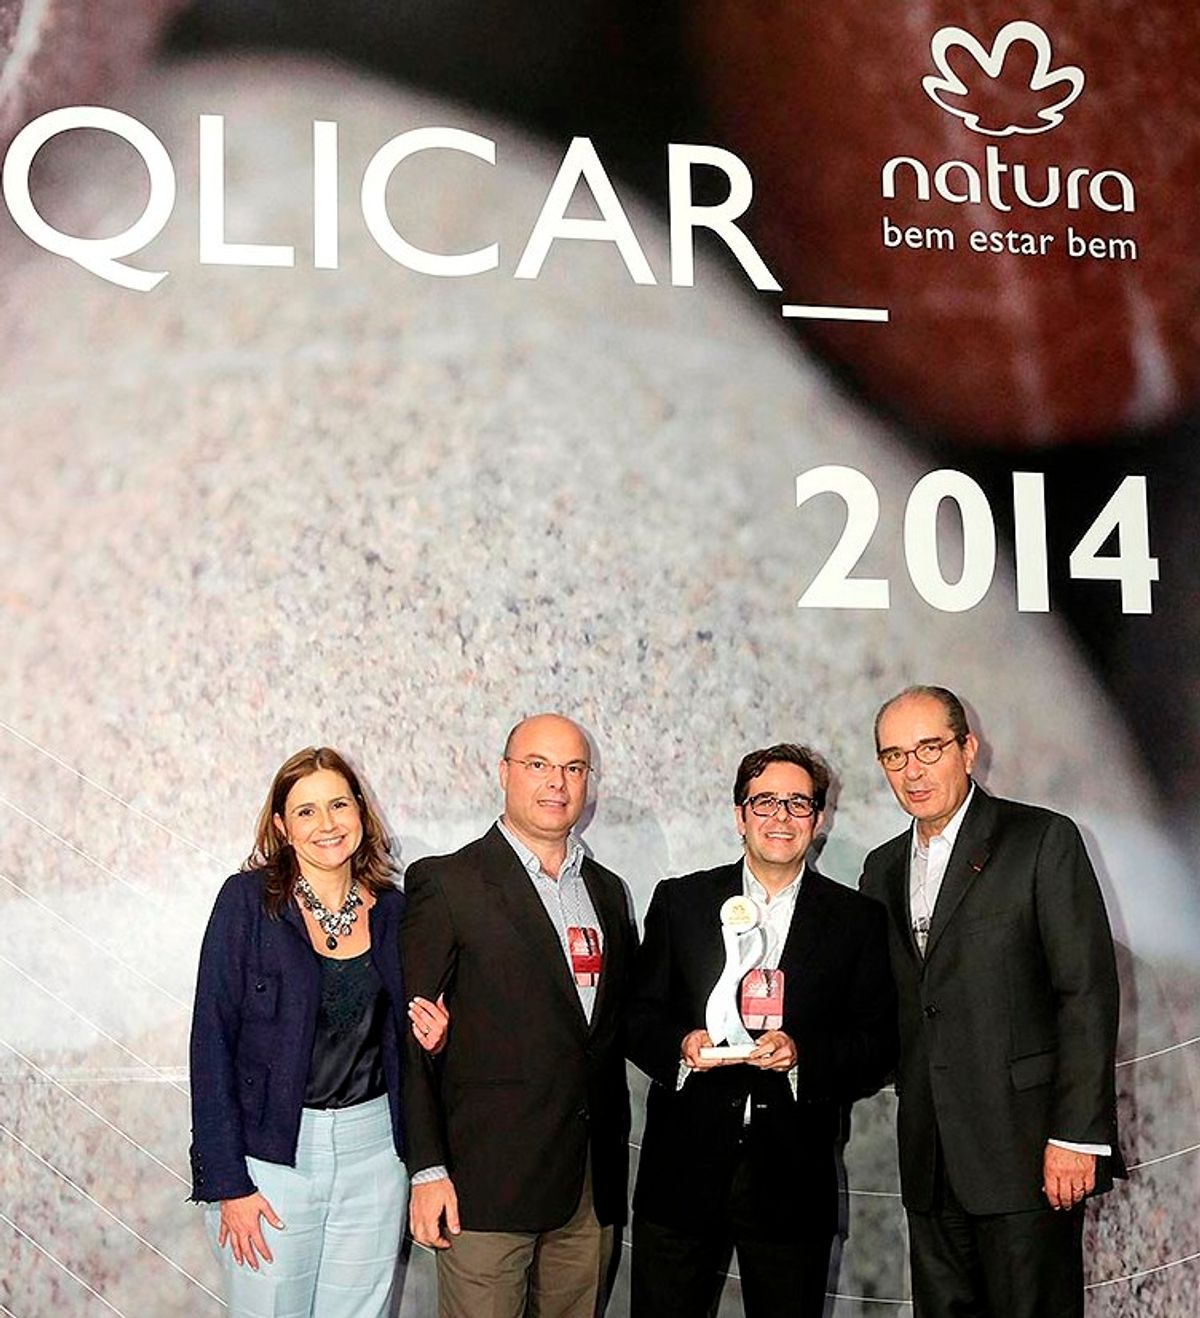 Penske Logistics South America Honored by Beauty Maker Natura